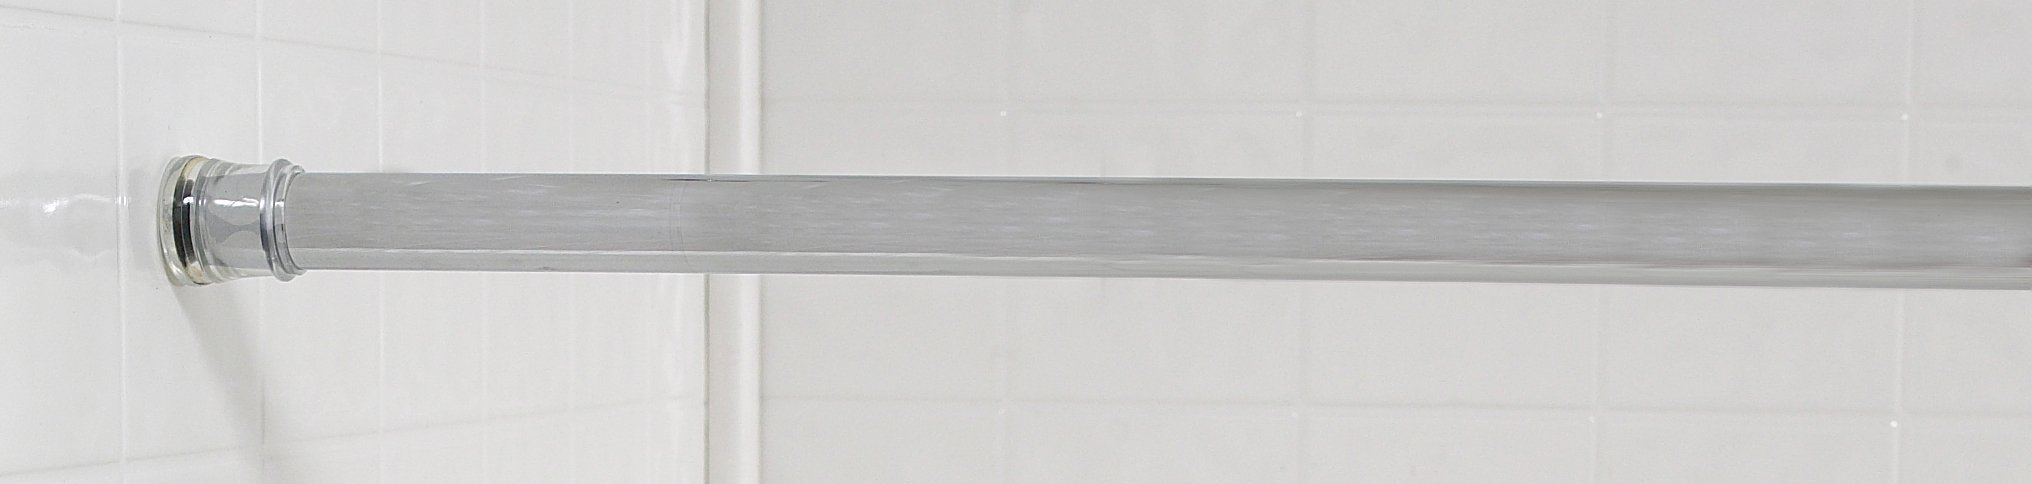 Royal Bath Steel Shower Curtain Tension Rod (41'' - 76'' Adjustable) - Chrome